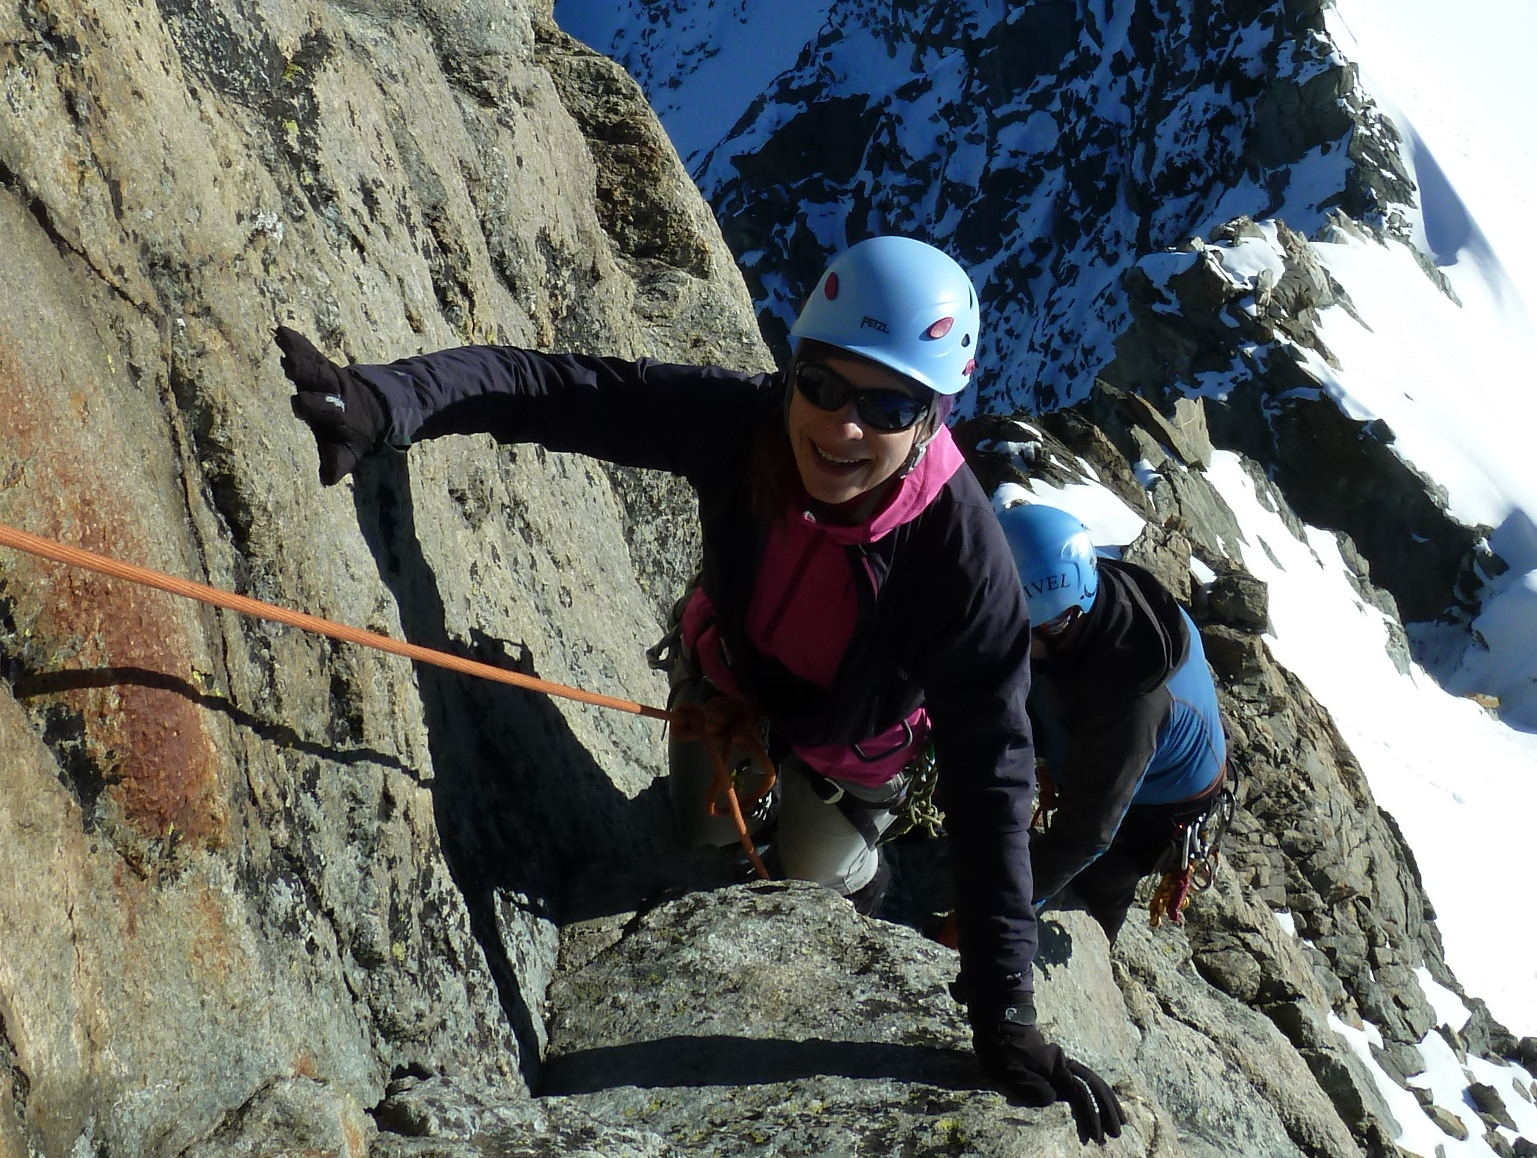 Aiguille de la Tsa Climb Arolla